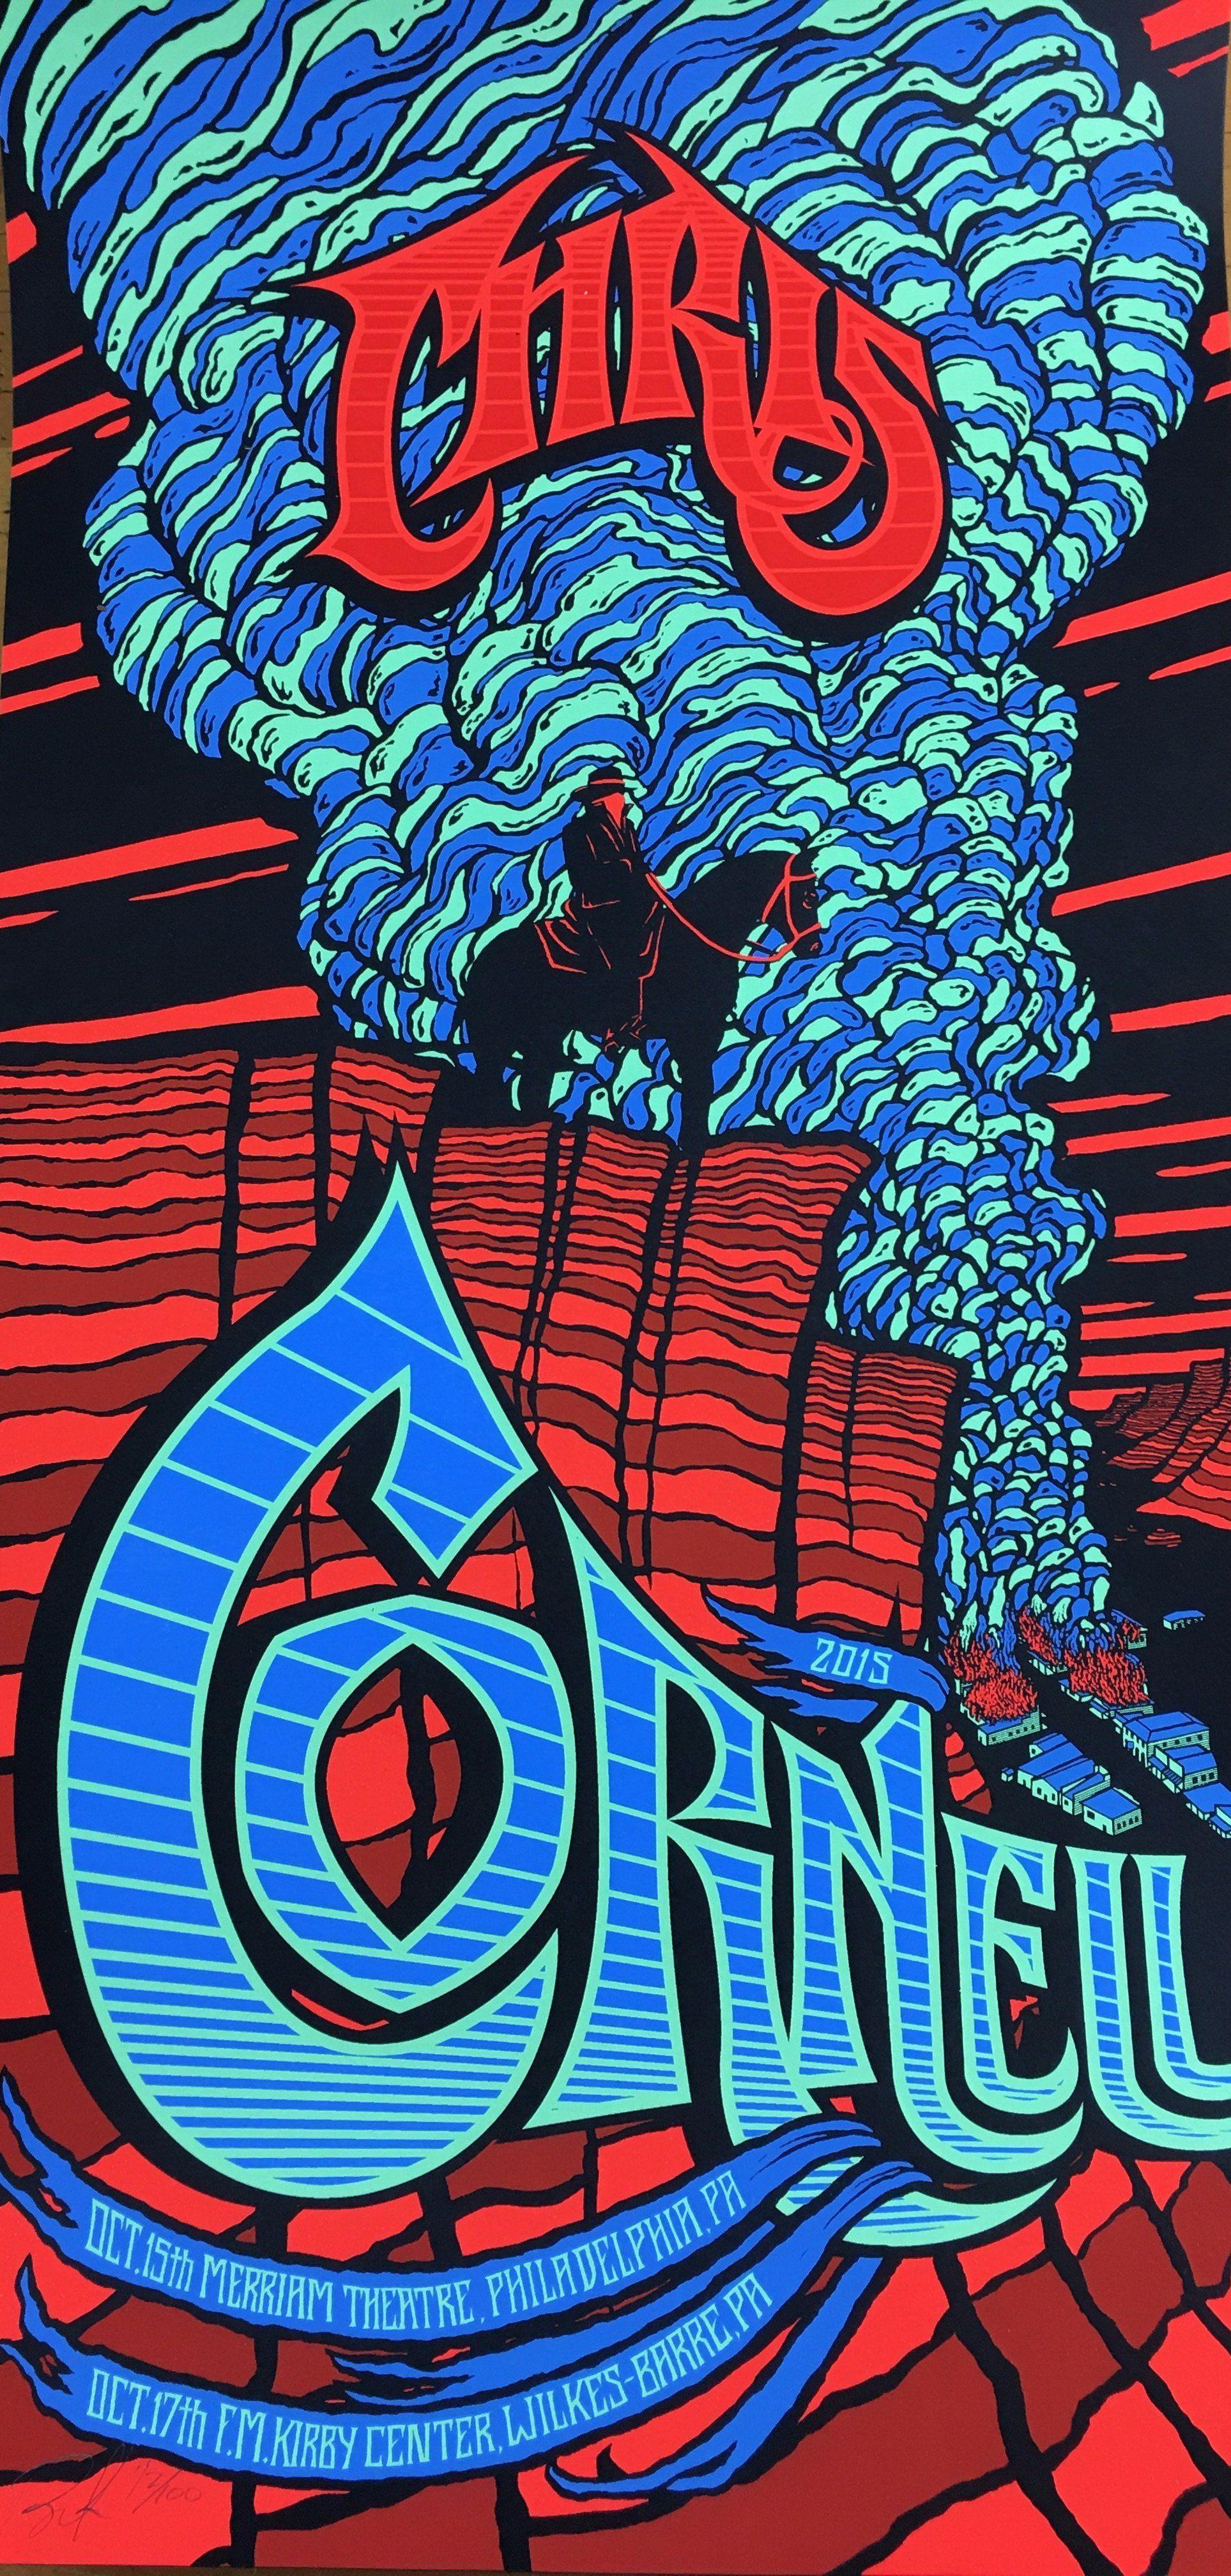 Chris Cornell 2015 Brad Klausen Poster Philadelphia Pa Merriam Theatre Poster Art Chris Cornell Rock Posters